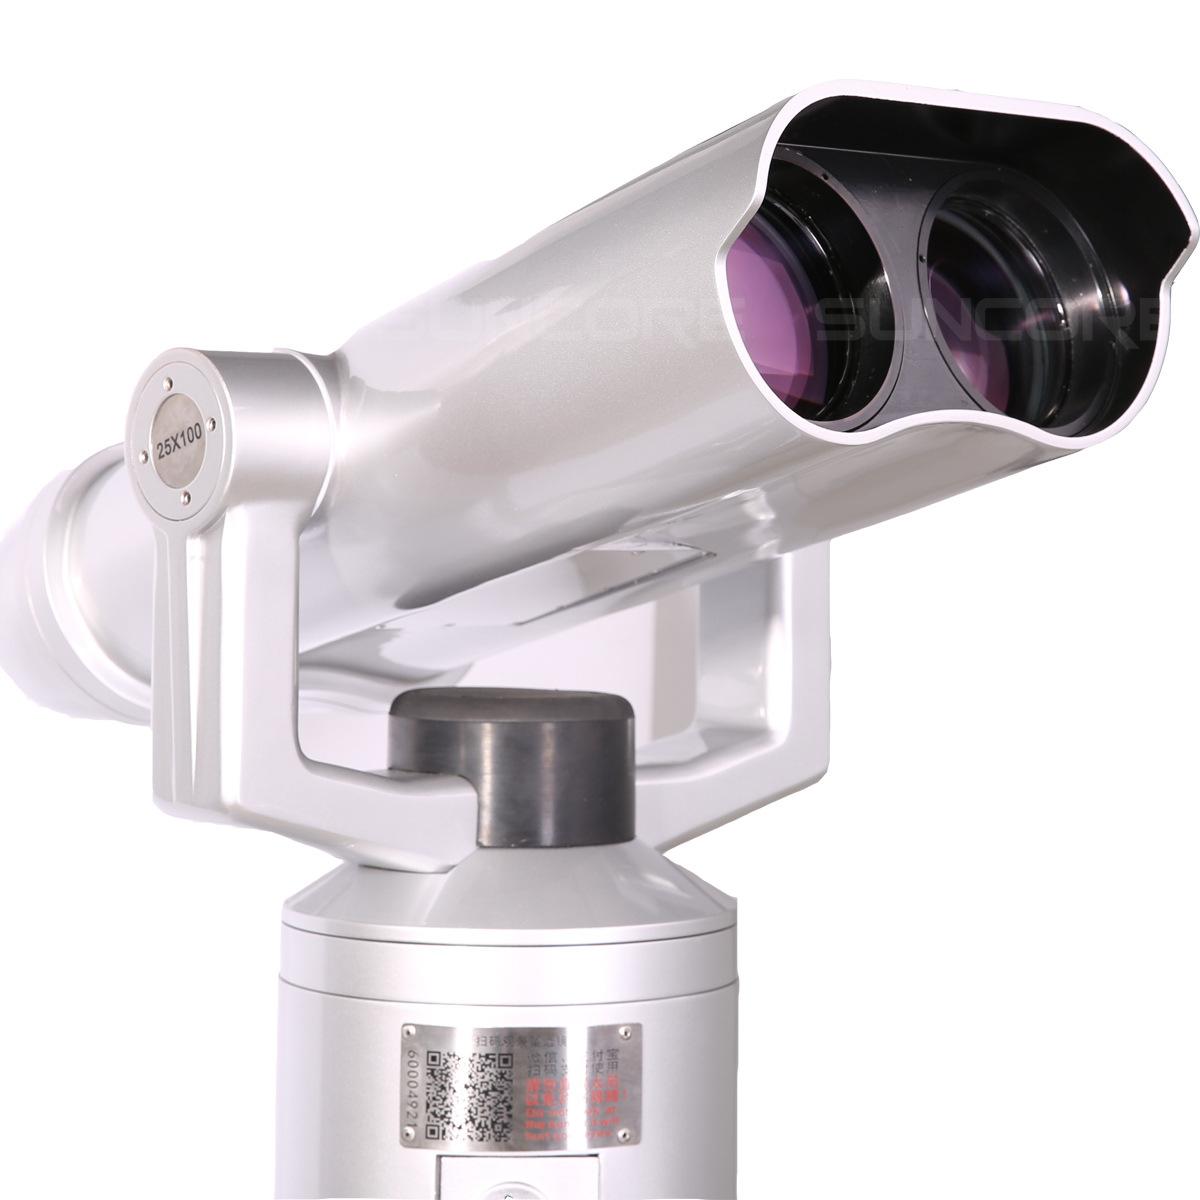 SUNCORE舜光 景区扫码共享望远镜 投币望远镜25X100高清哨所镜 观景望远镜